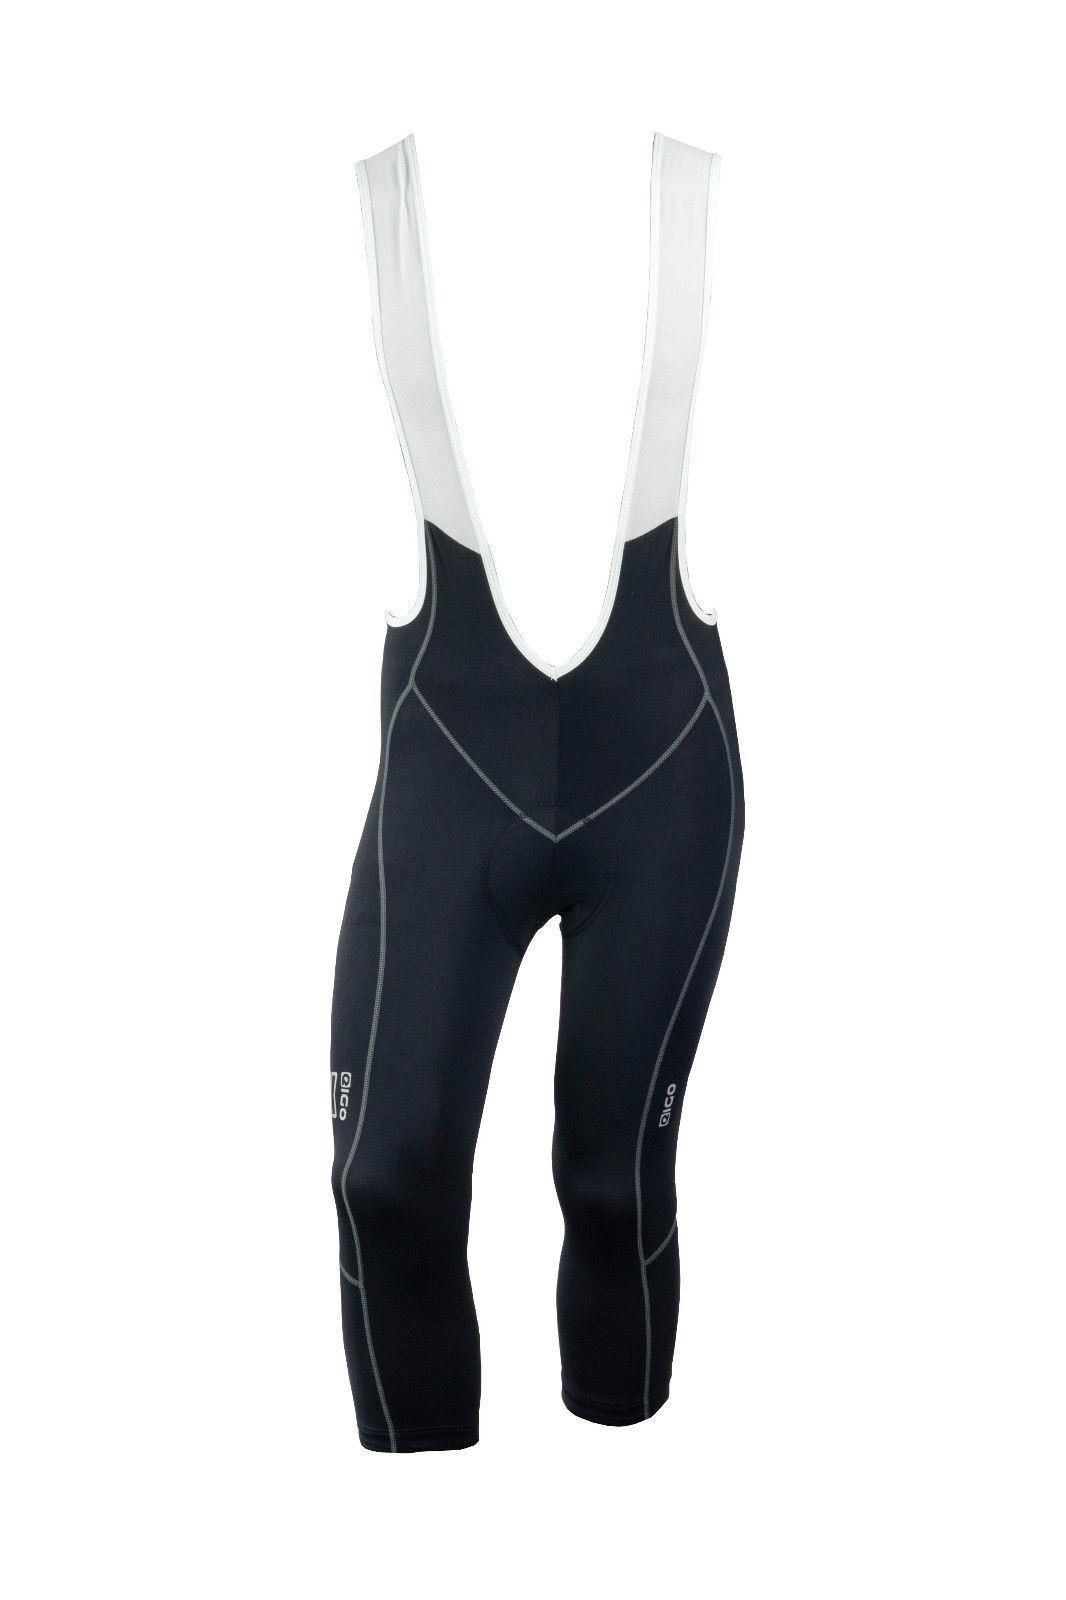 New Mens Cycling    Spin   Spinning Eigo Lycra 'Classic' 3 4 Length Bib Shorts  floor price